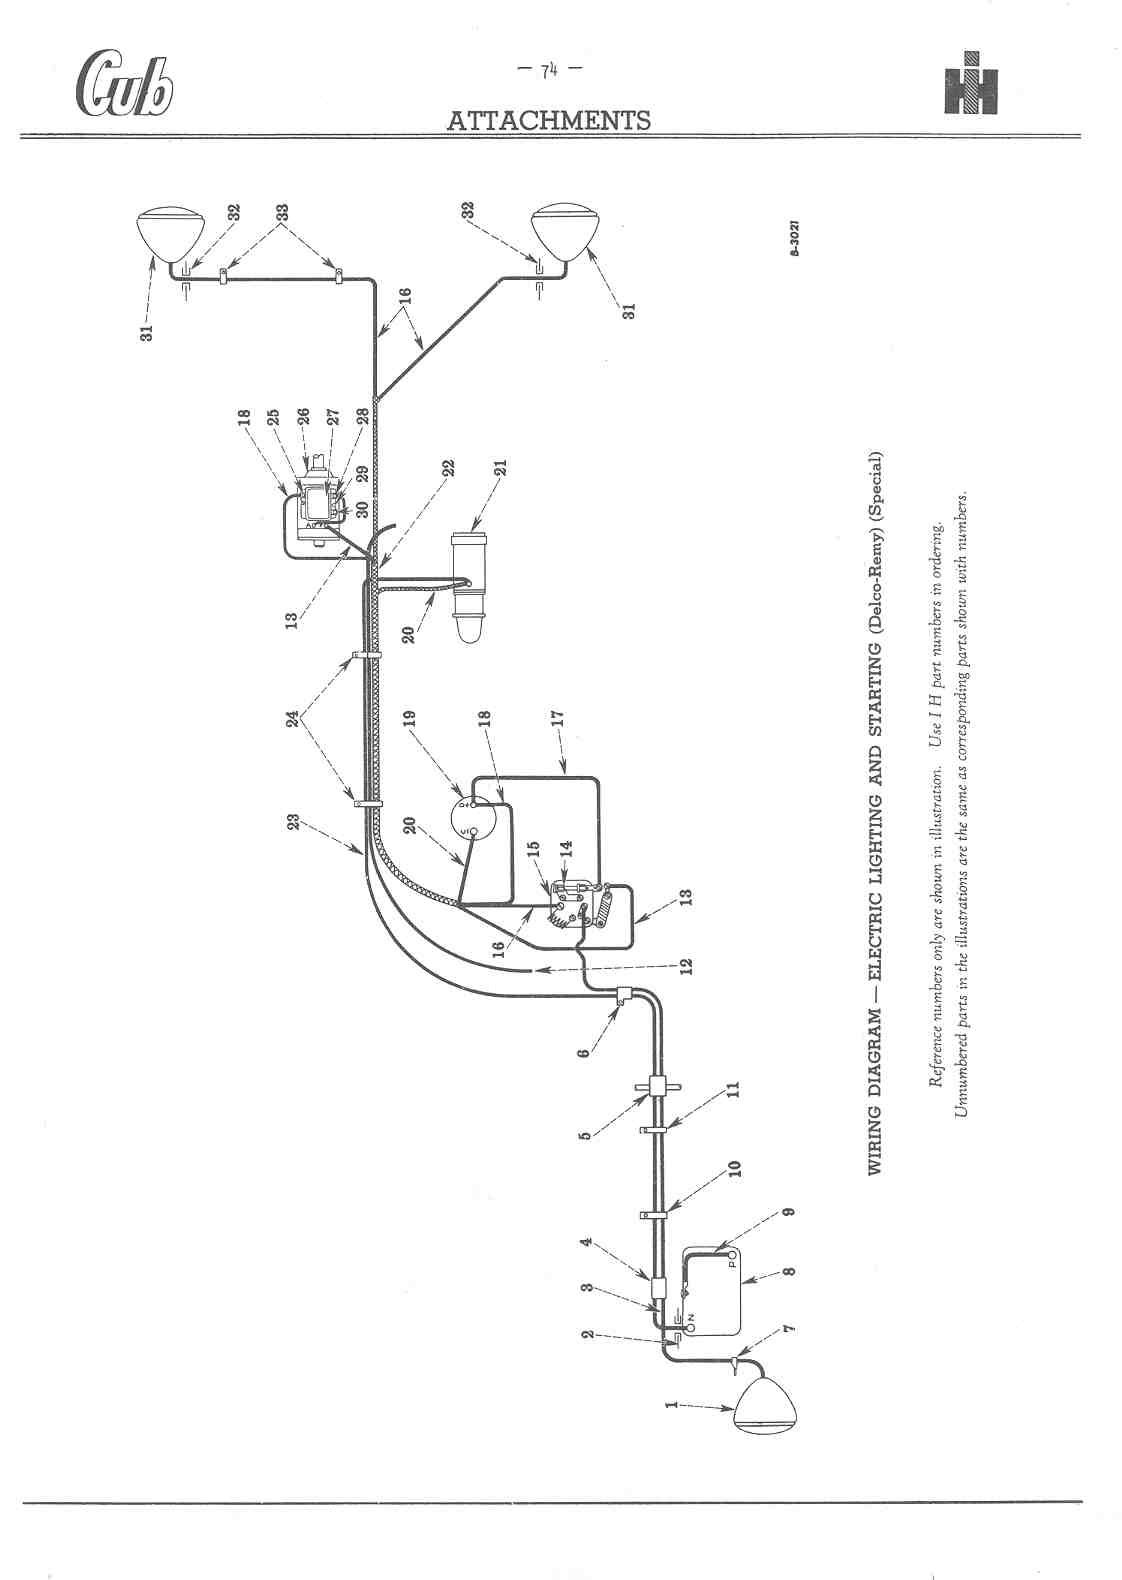 Farmall Cub Clutch Diagram - All Diagram Schematics